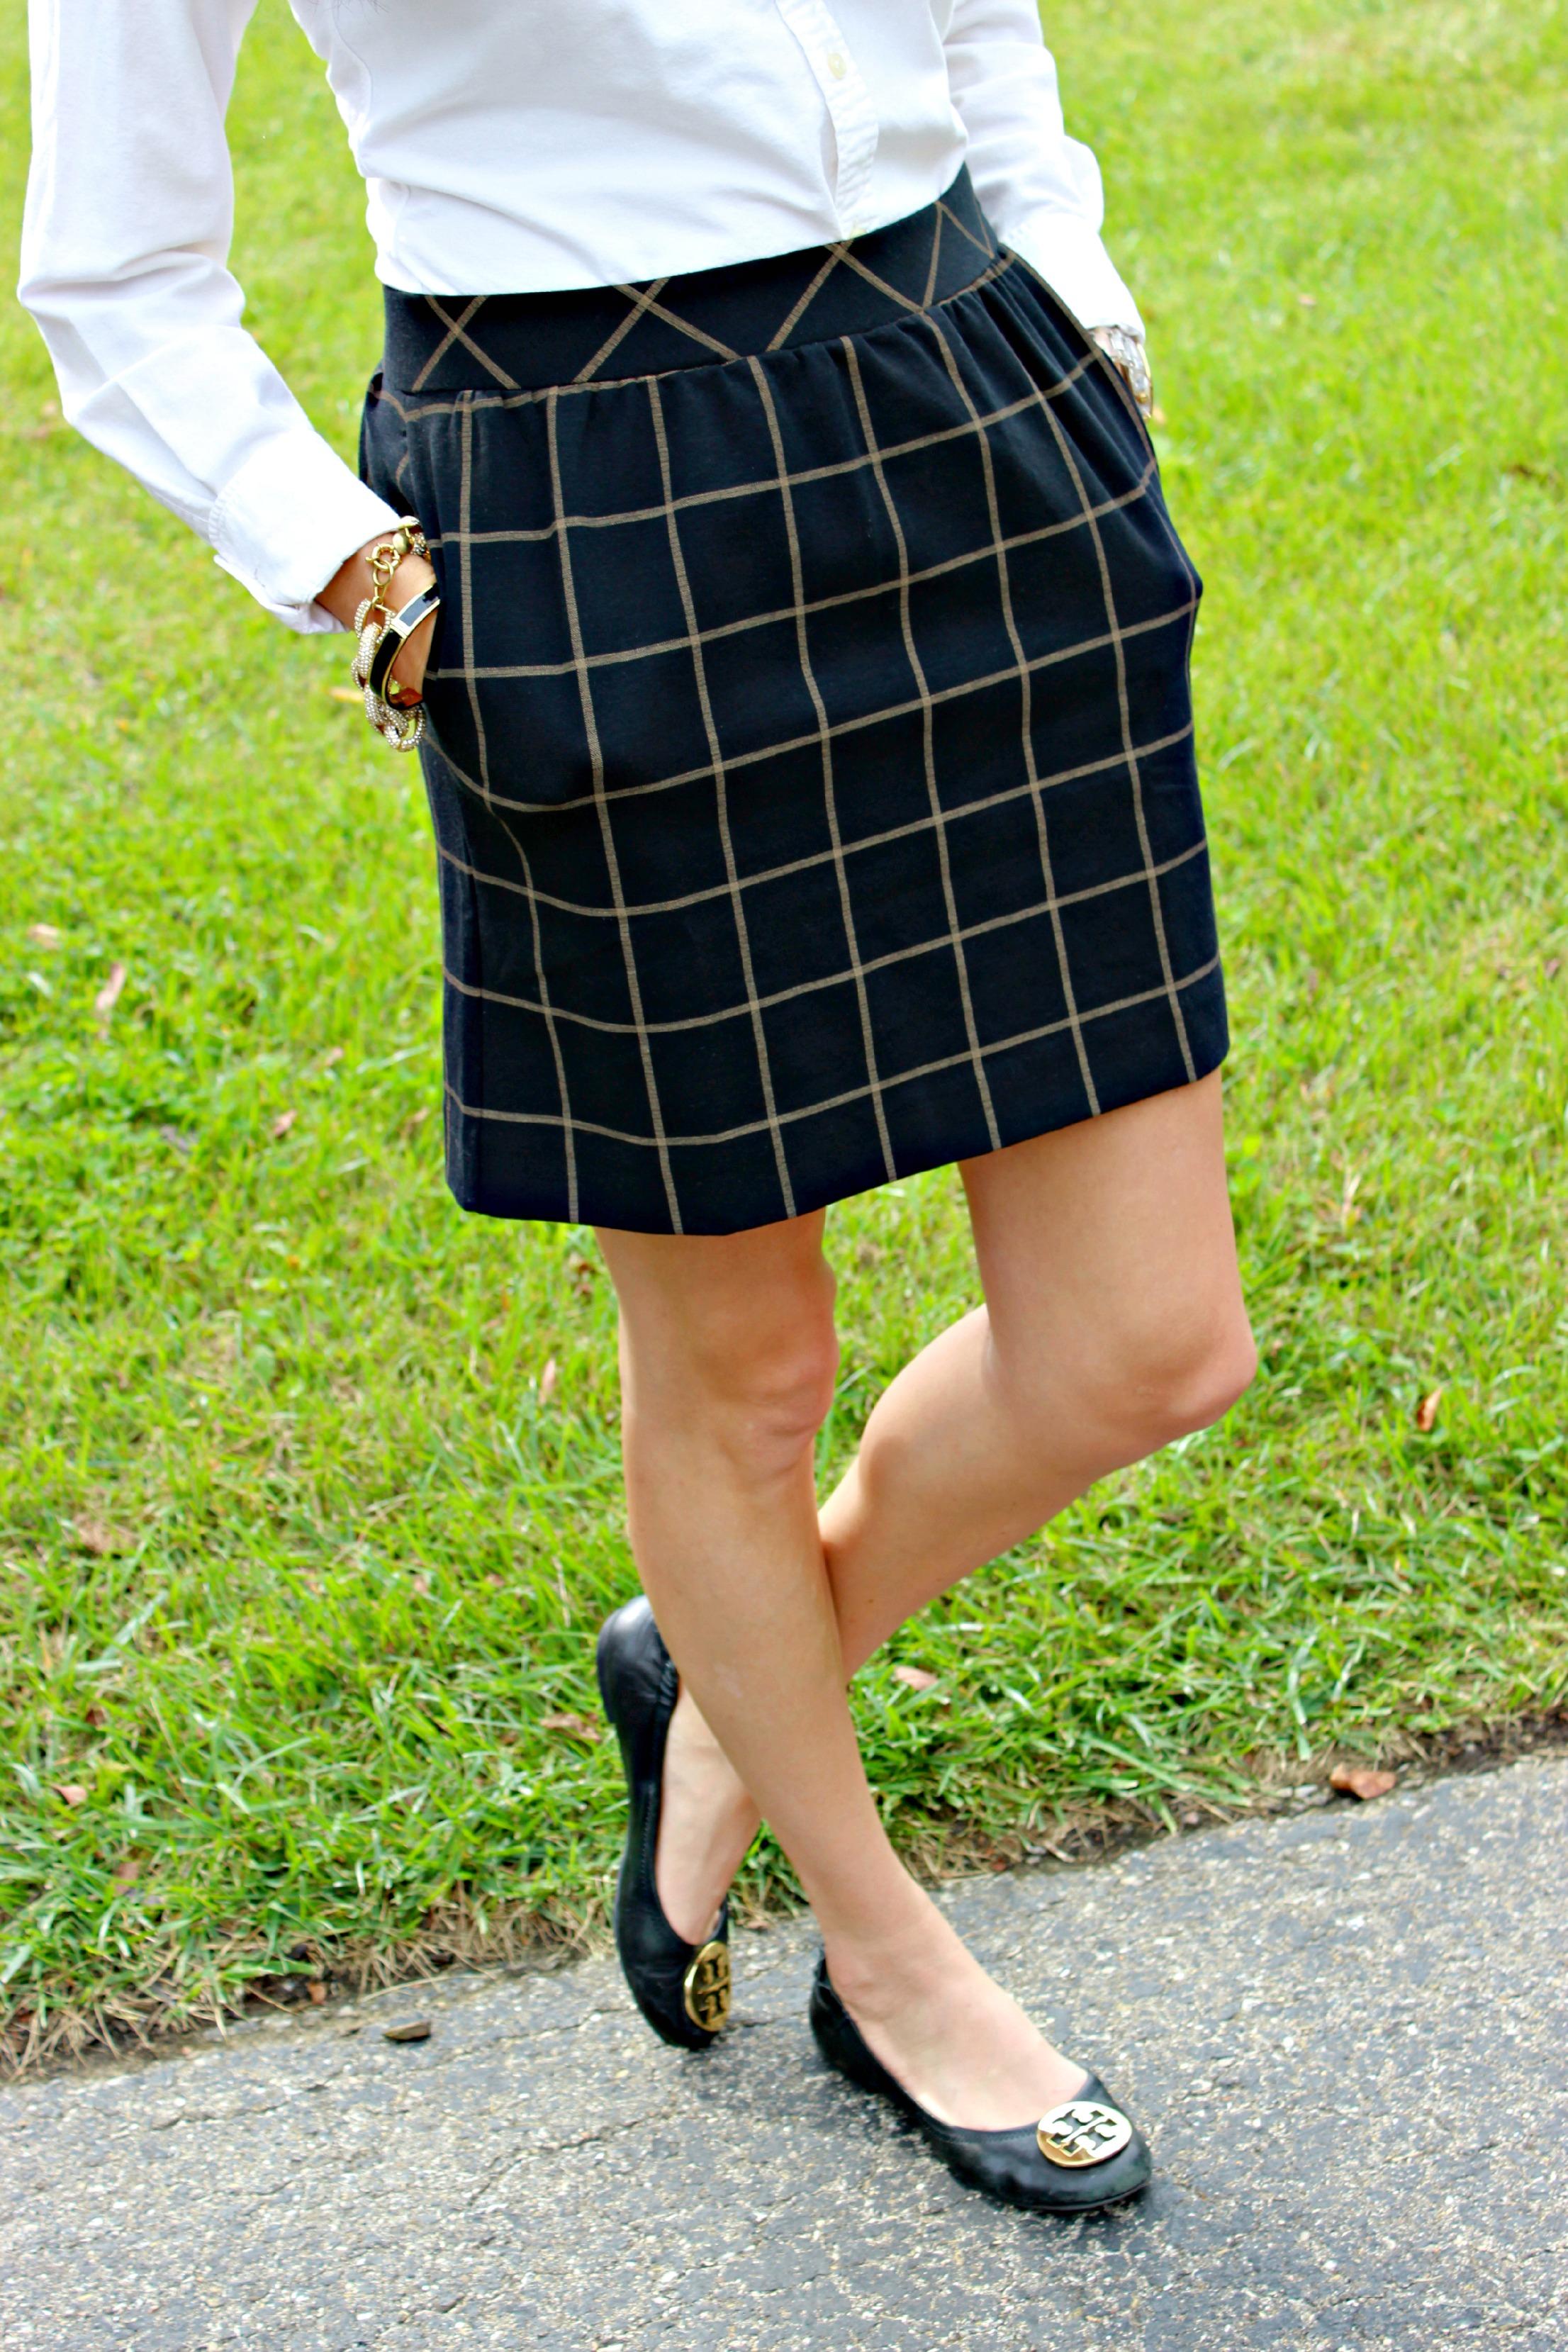 Madewell Windowpane Plaid Print Skirt, Tory Burch Reva Flats